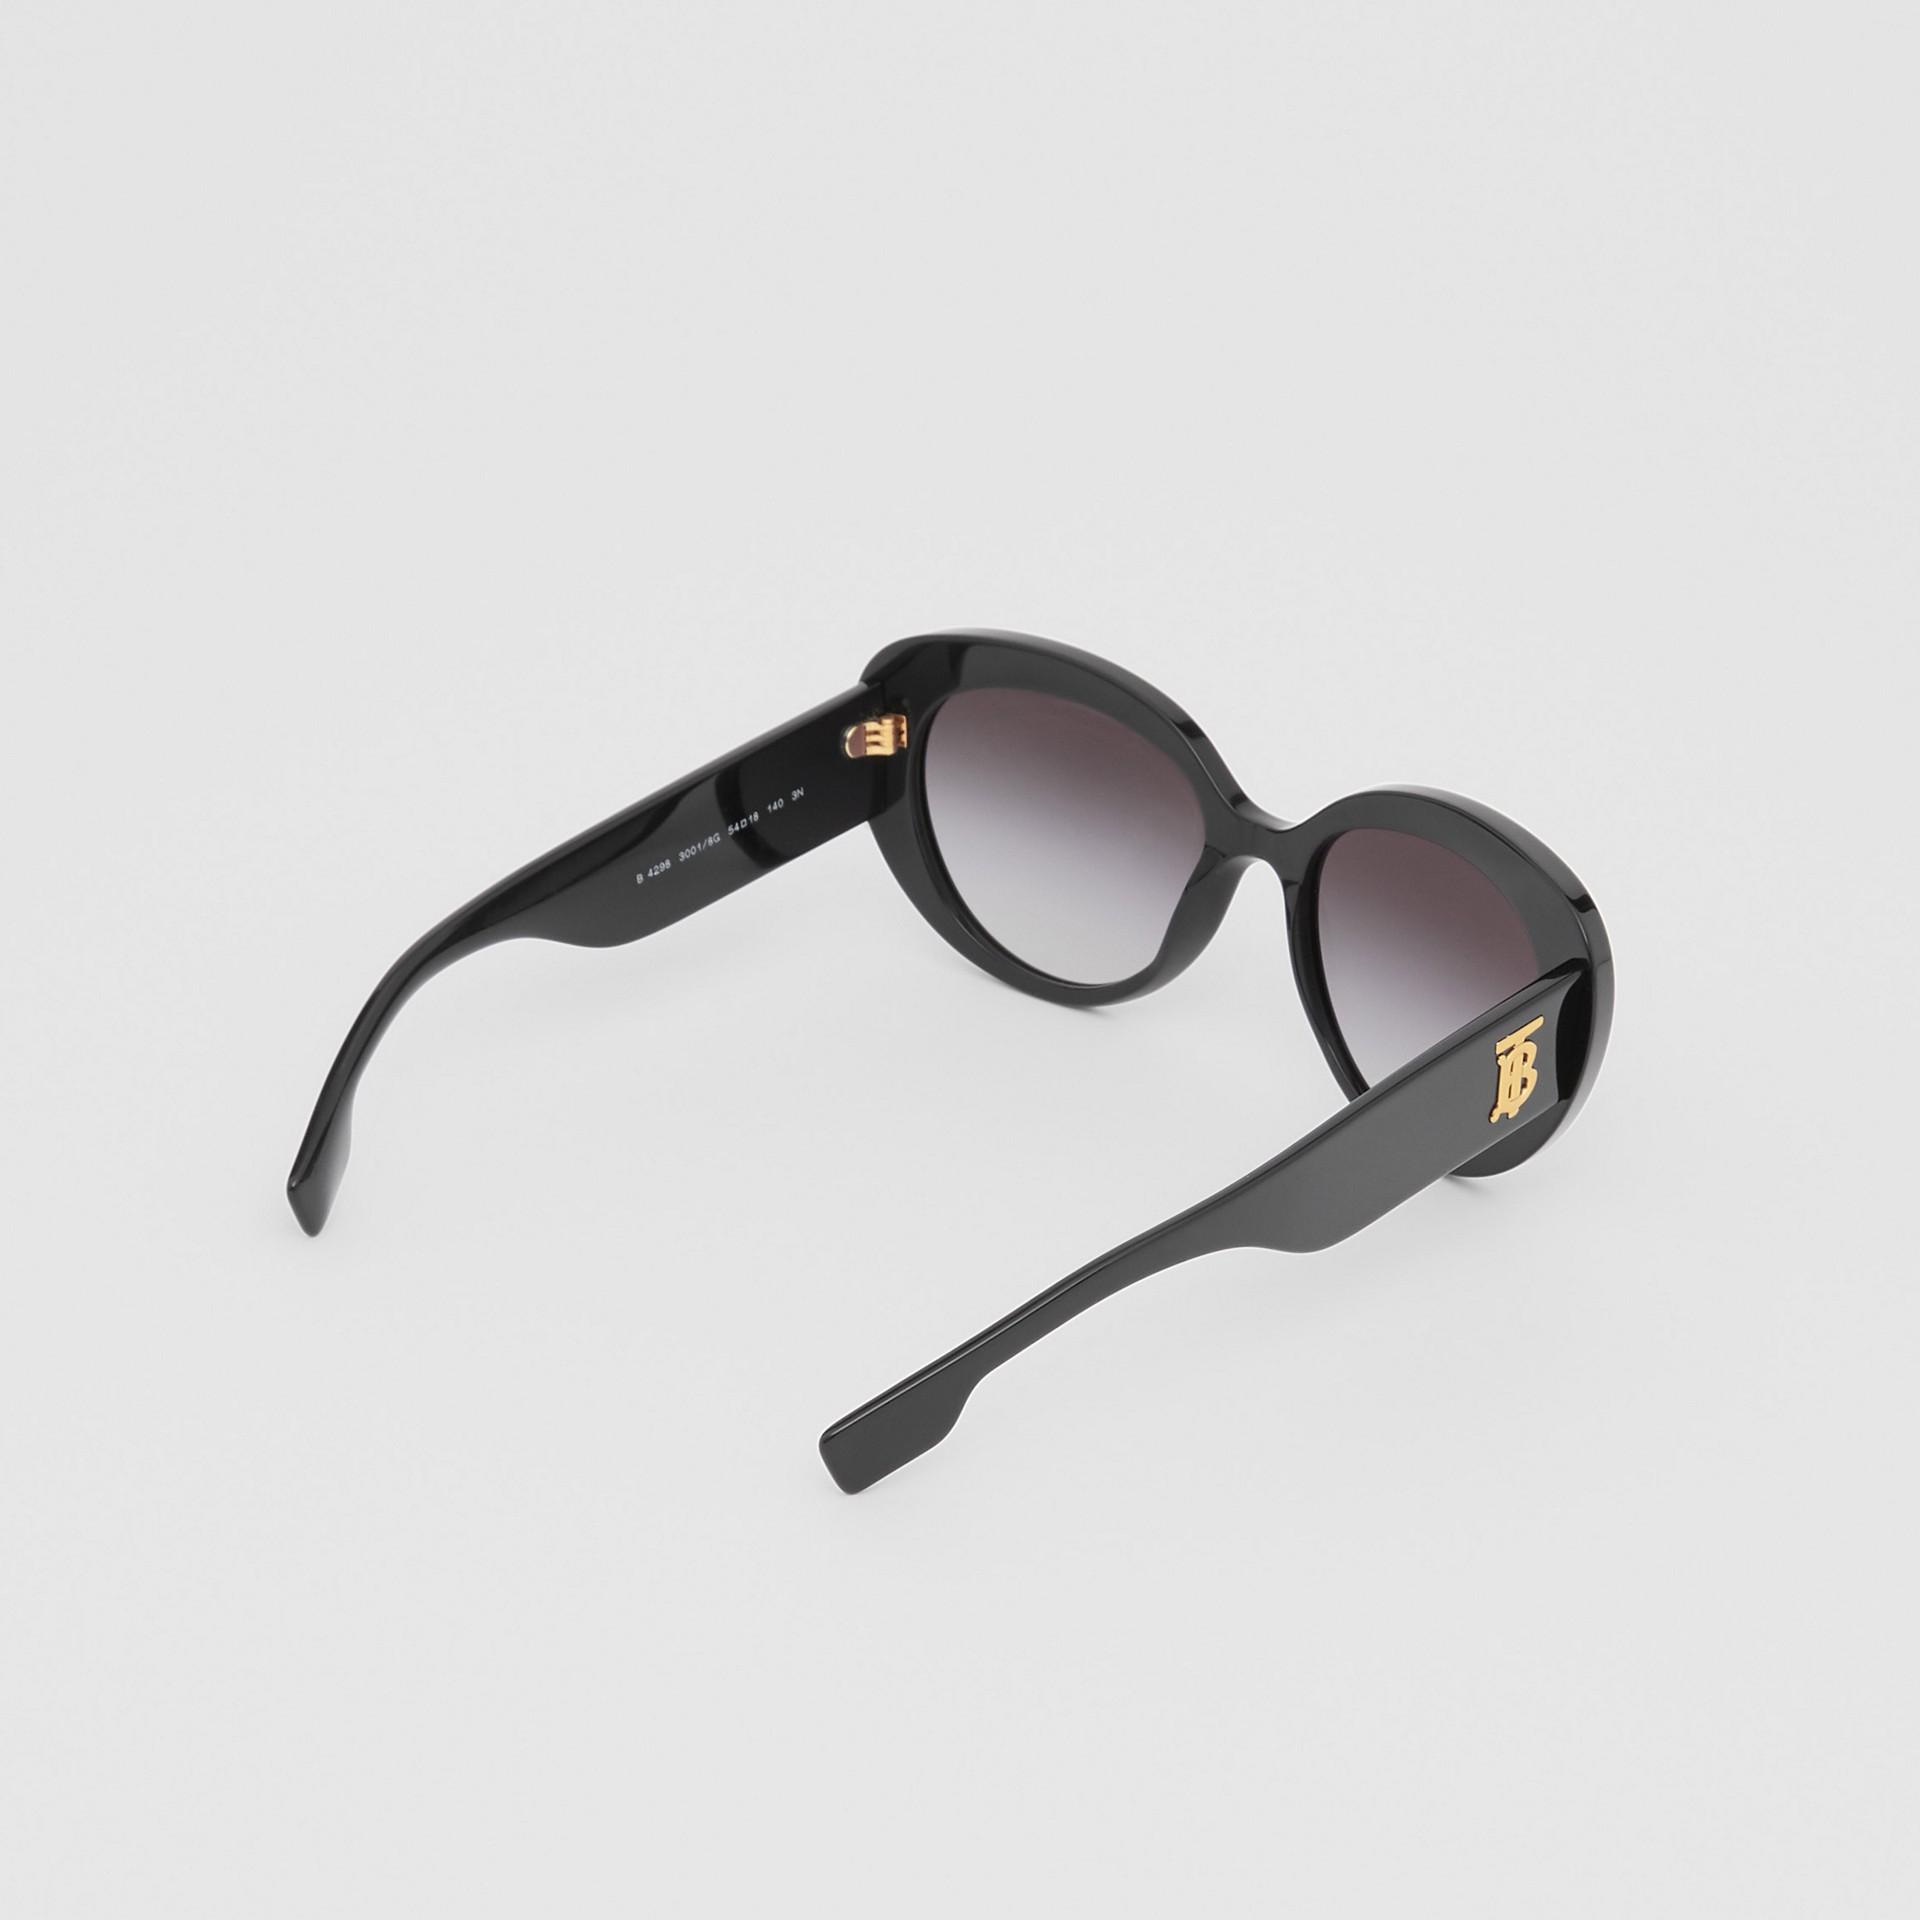 Monogram Motif Cat-eye Frame Sunglasses in Black - Women | Burberry - gallery image 4